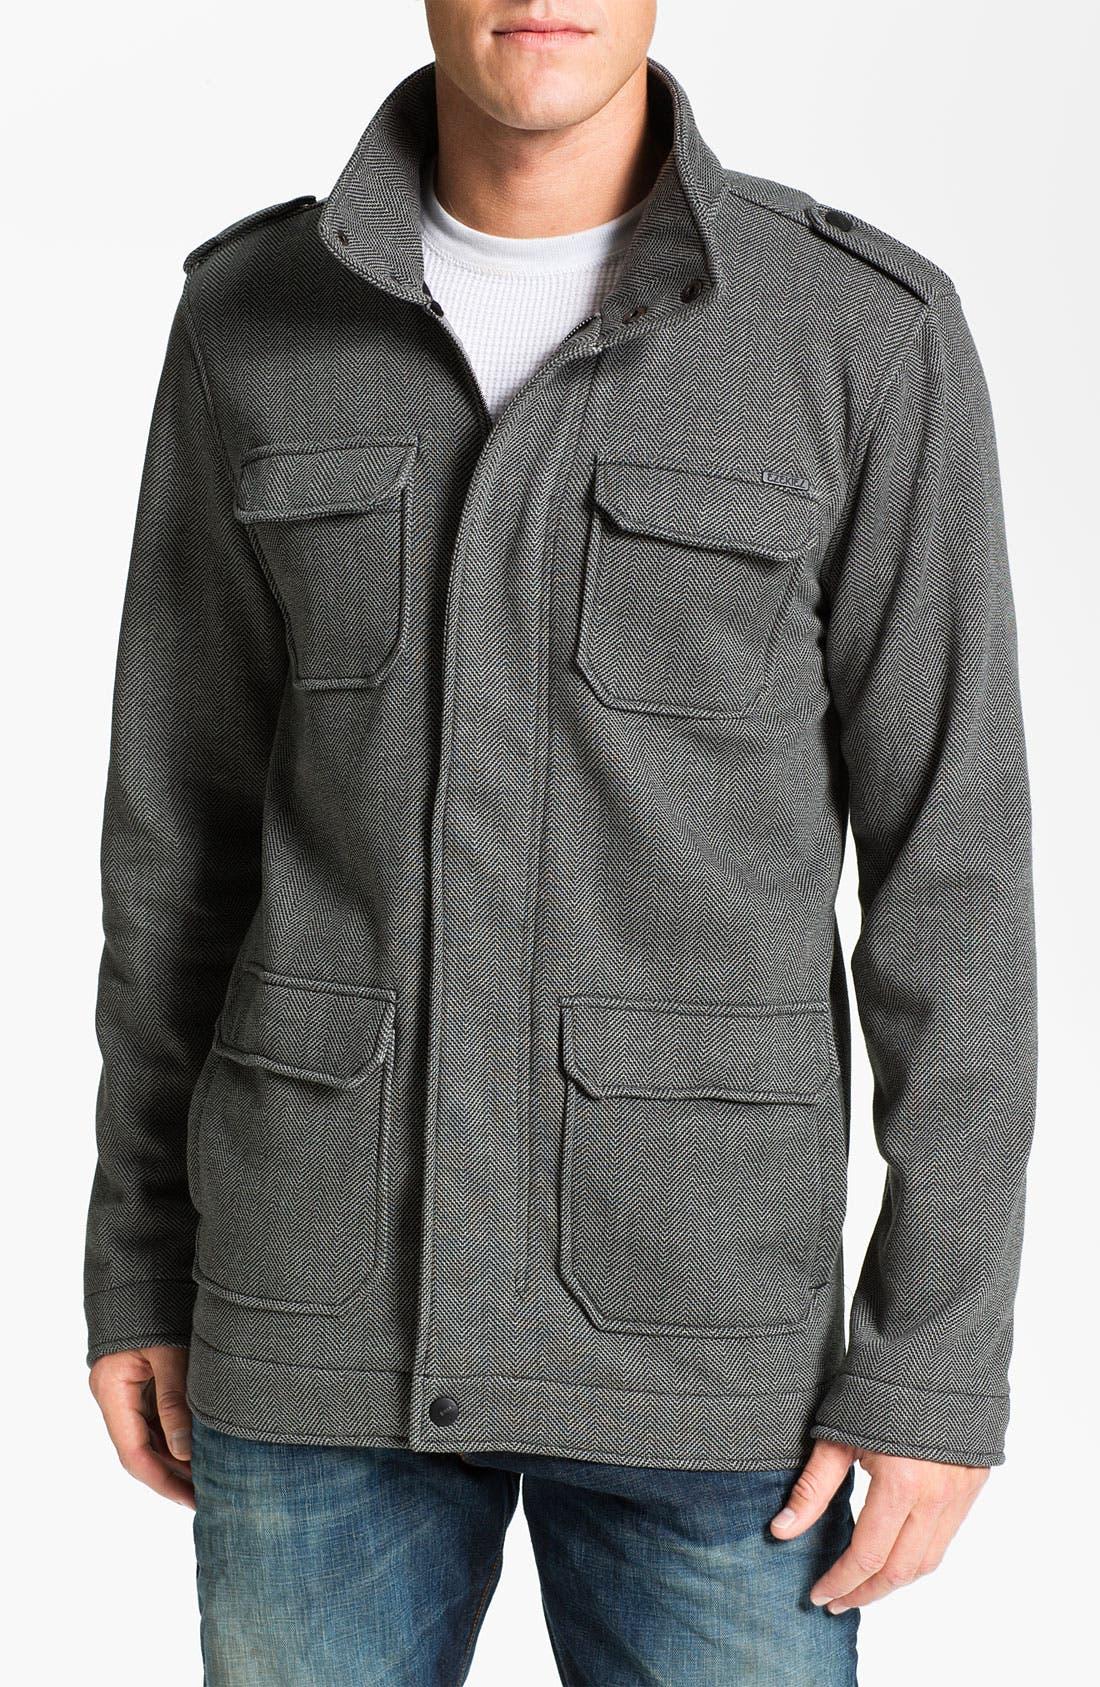 Alternate Image 1 Selected - Ezekiel 'Cavalier' Jacket